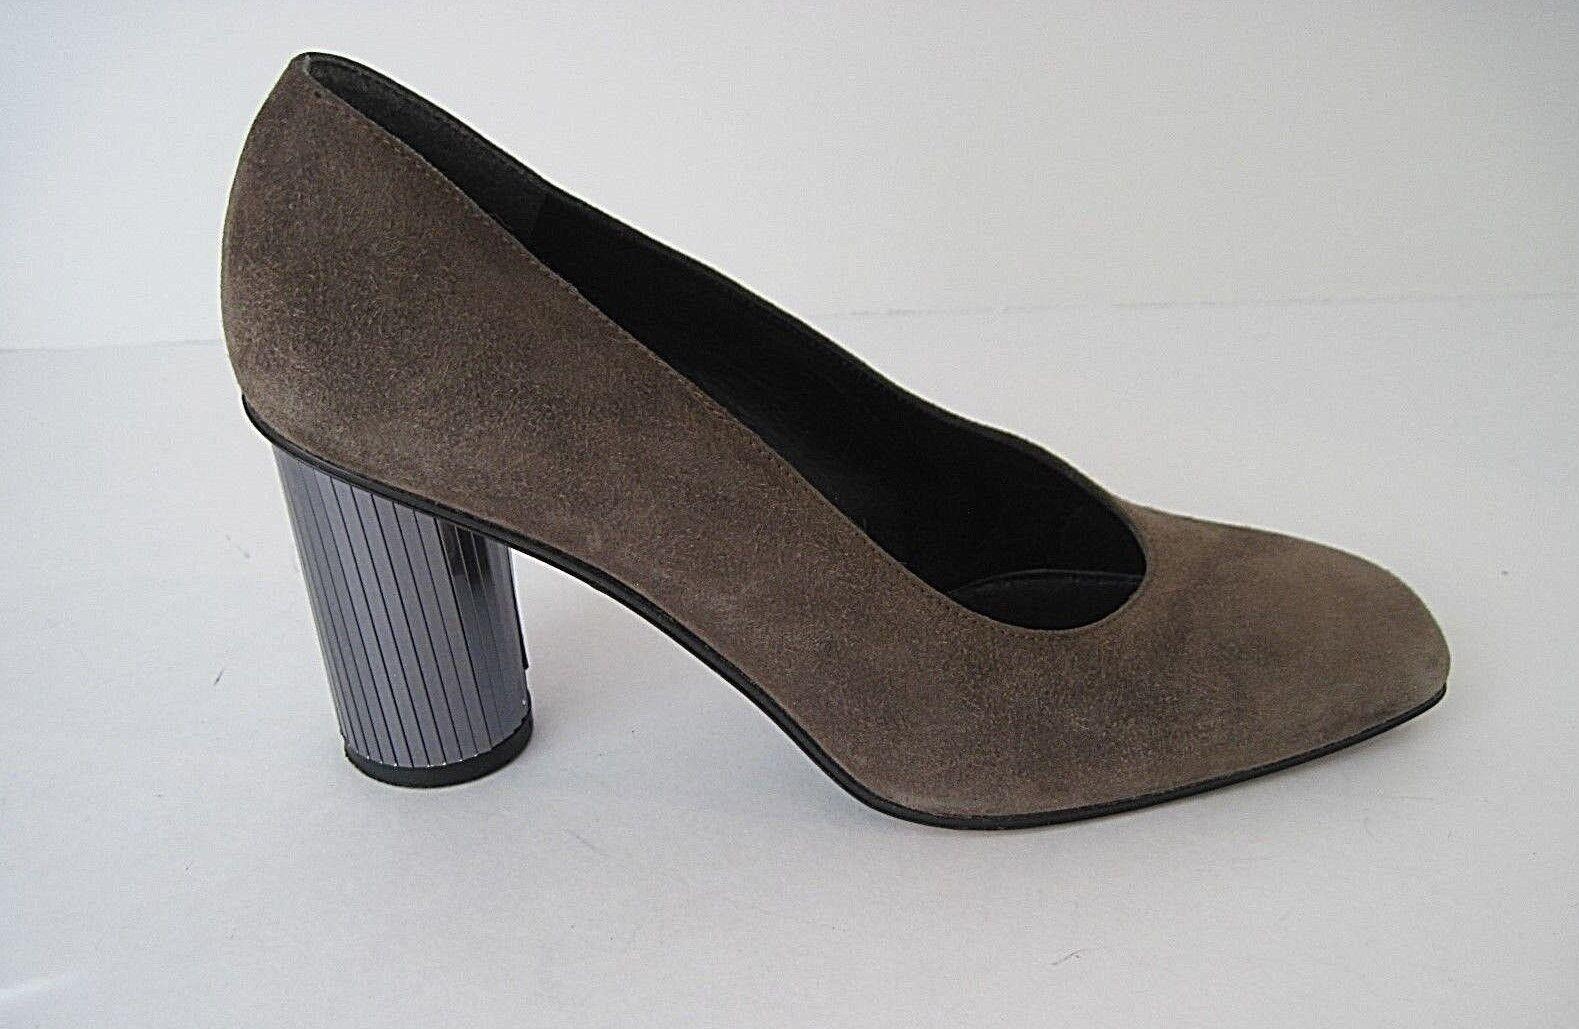 Stuart Weitzman Taupe Suede Pump Split Mirror Heel Detail Women's Size 6 1 2 M